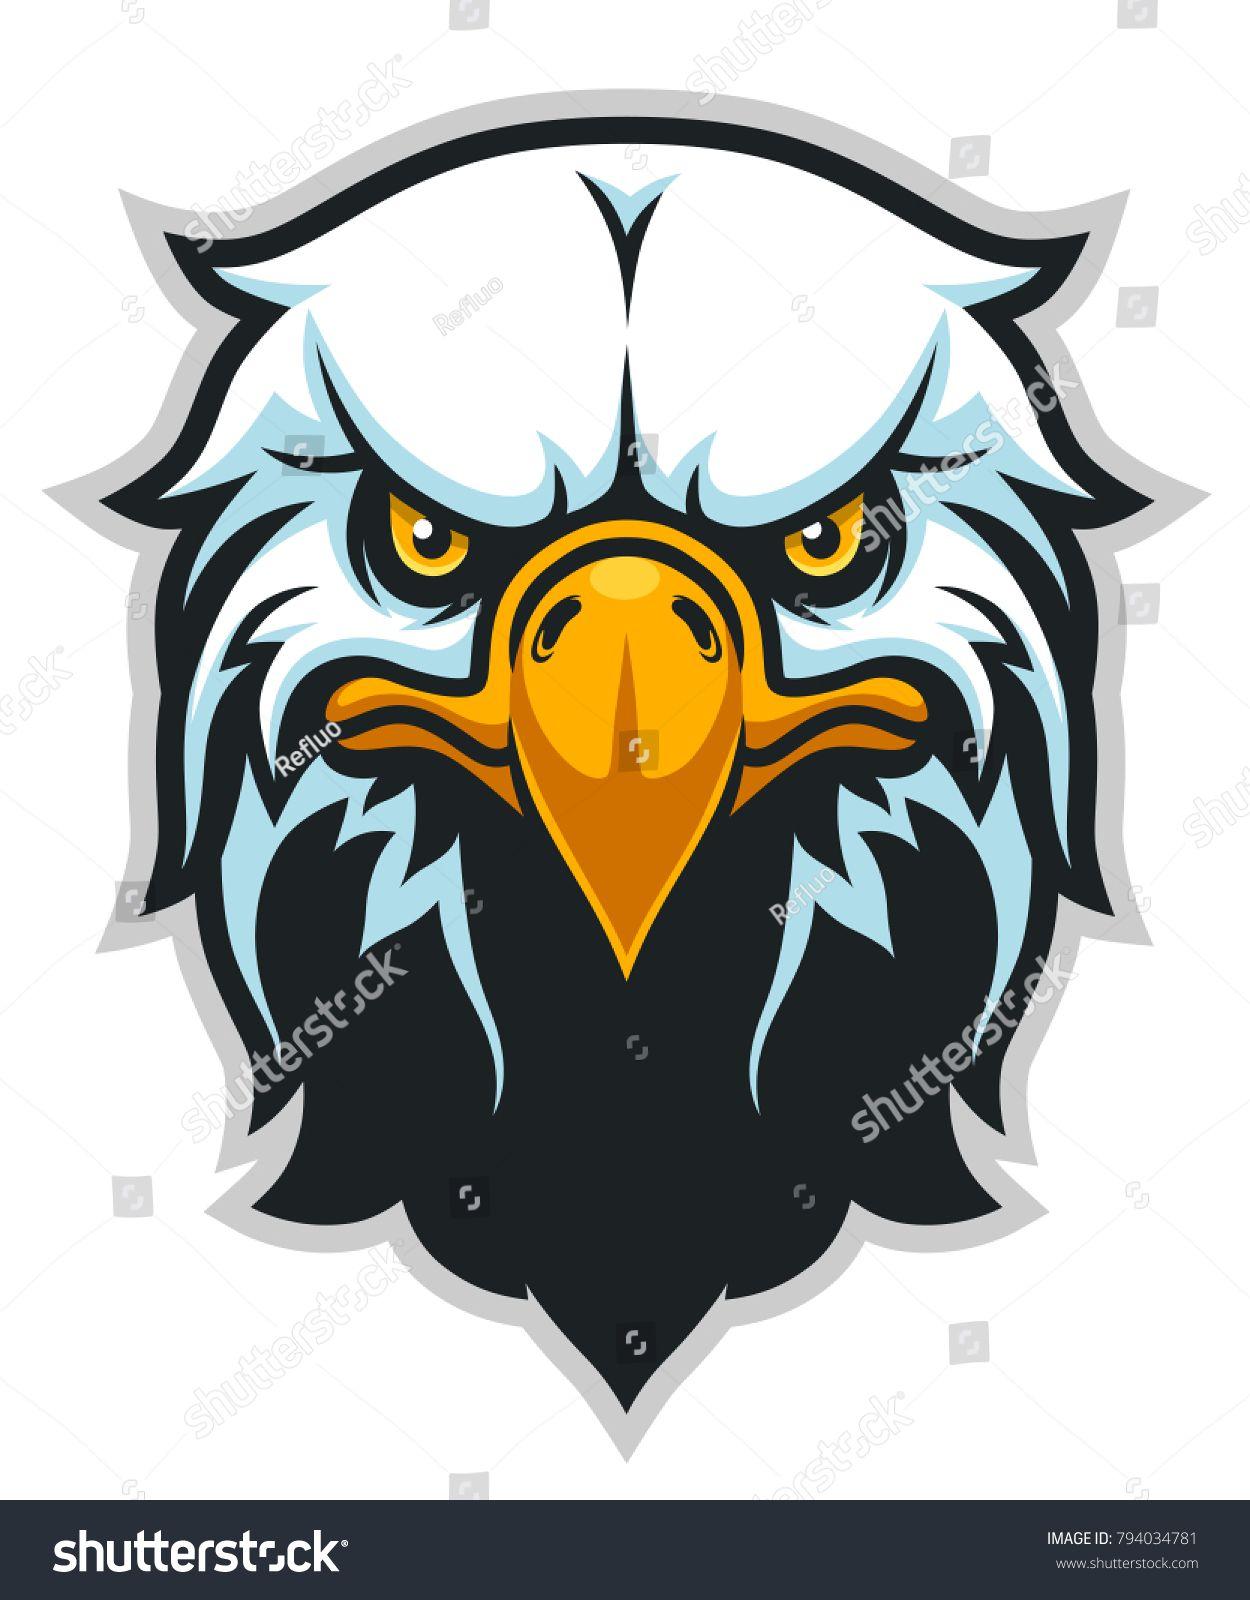 Vector Illustration Of Bald Eagle Head Can Be Used As Mascot Bald Illustration Vector Mascot Eagle Drawing Eagle Art Eagle Wallpaper